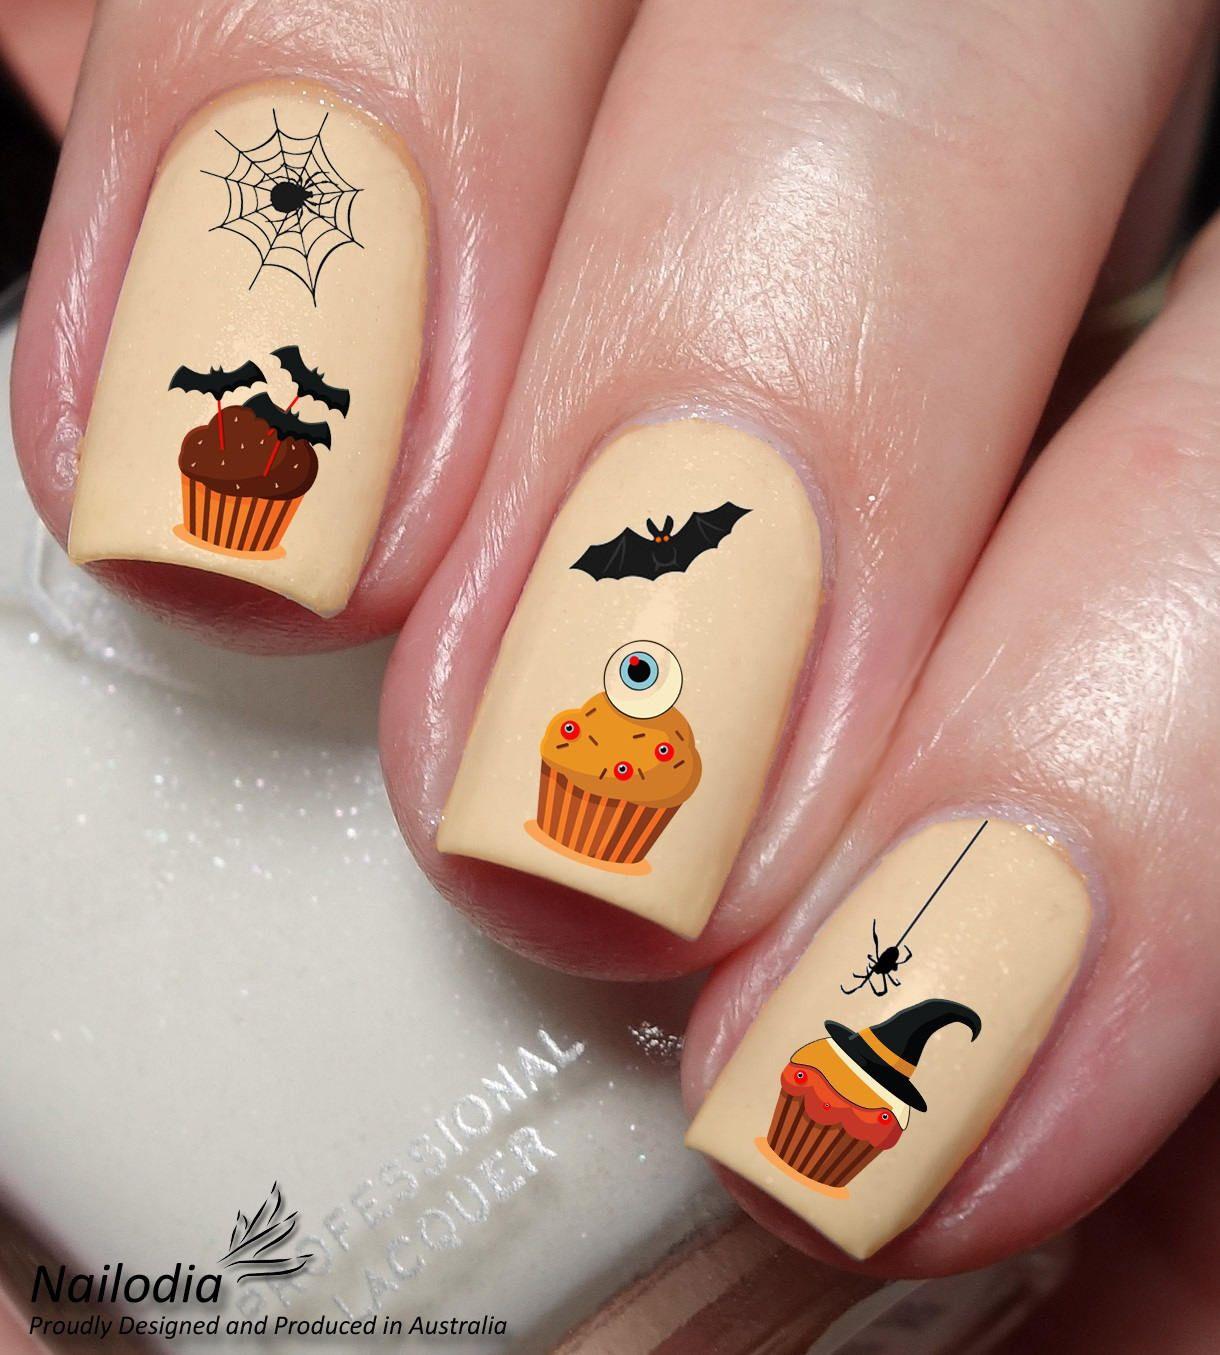 Halloween nail art decals in 2020 | Halloween nail art ...